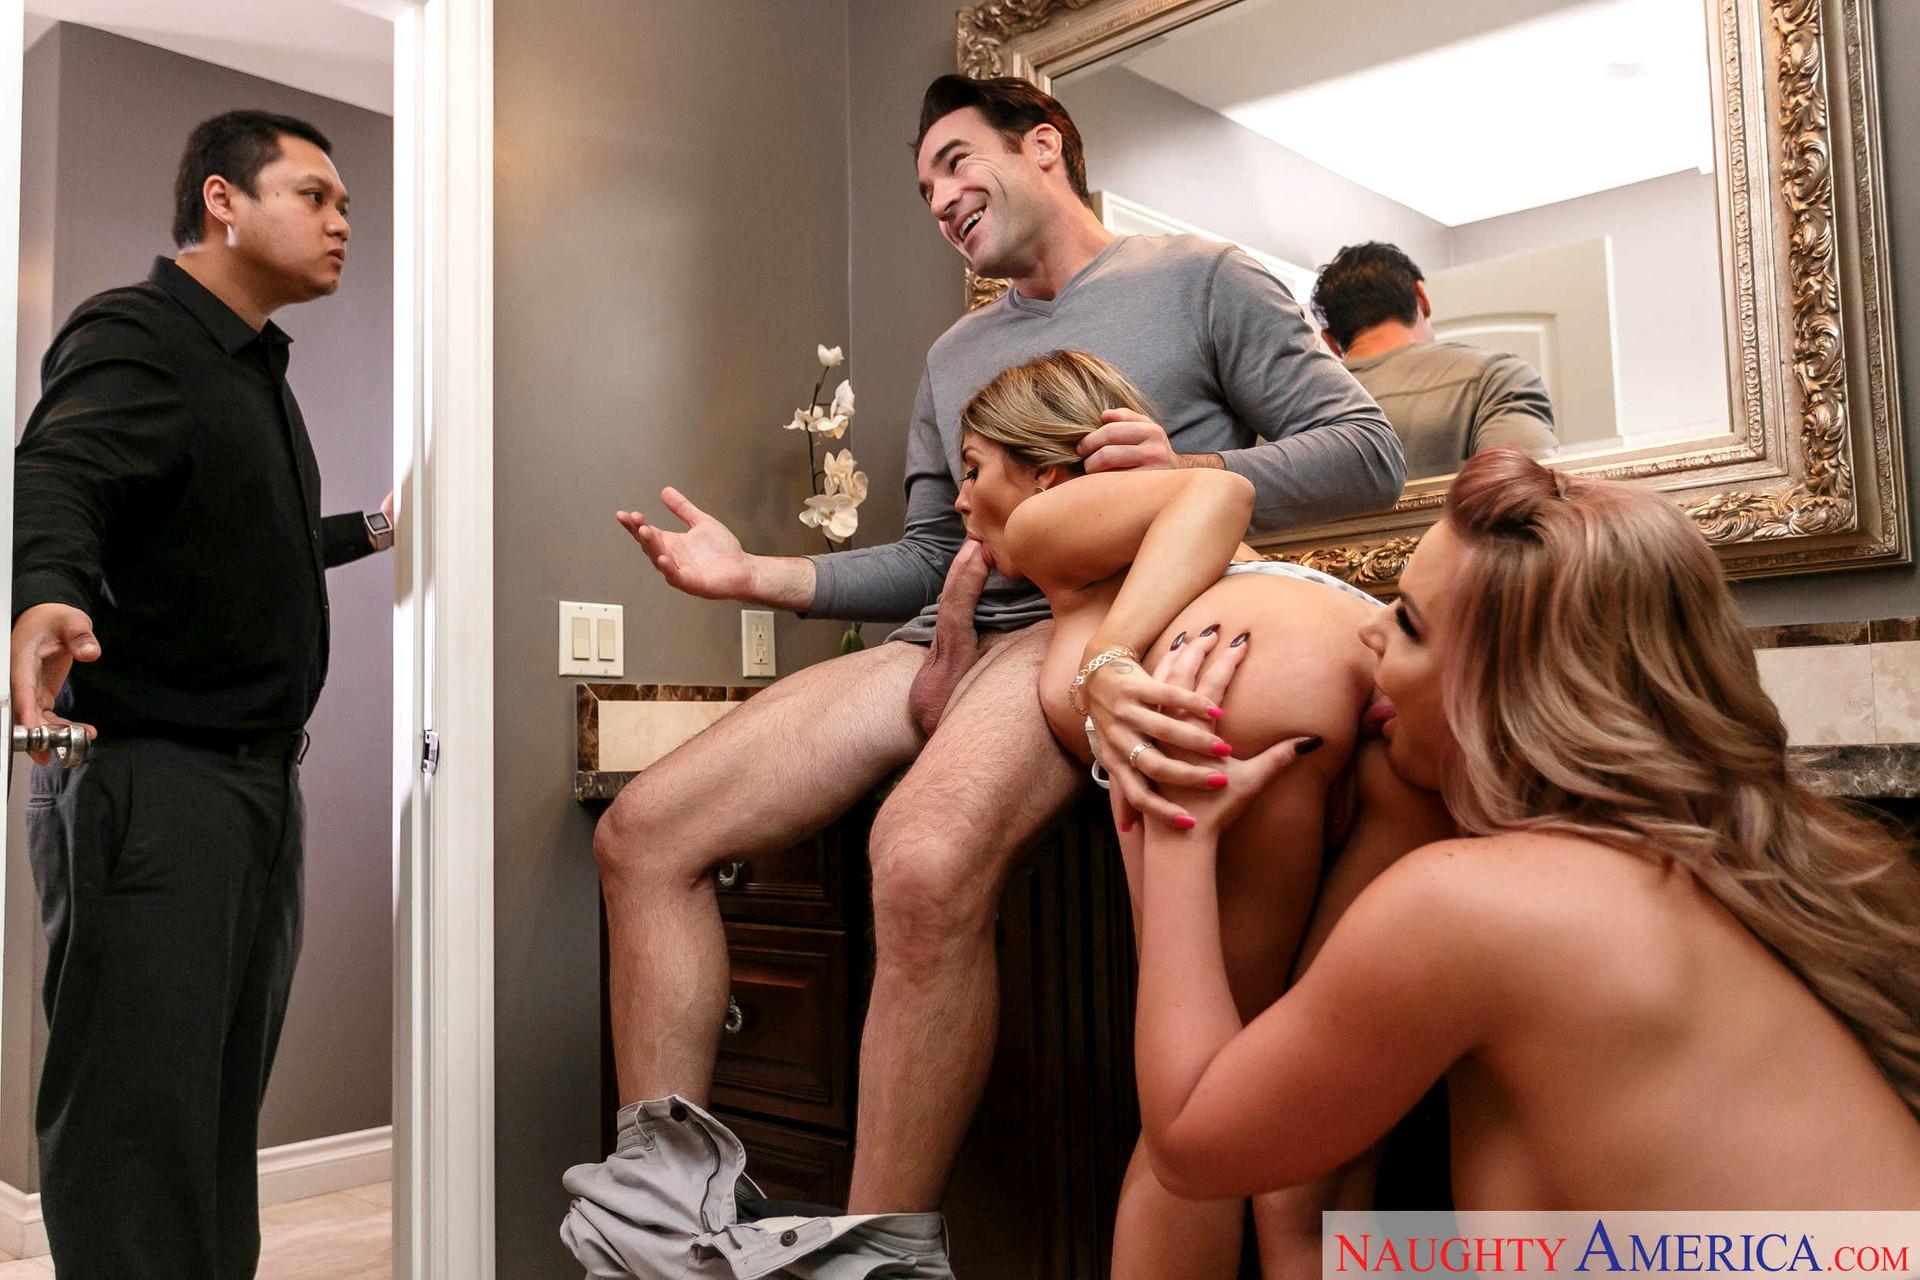 School girl naughty america threesome full movie